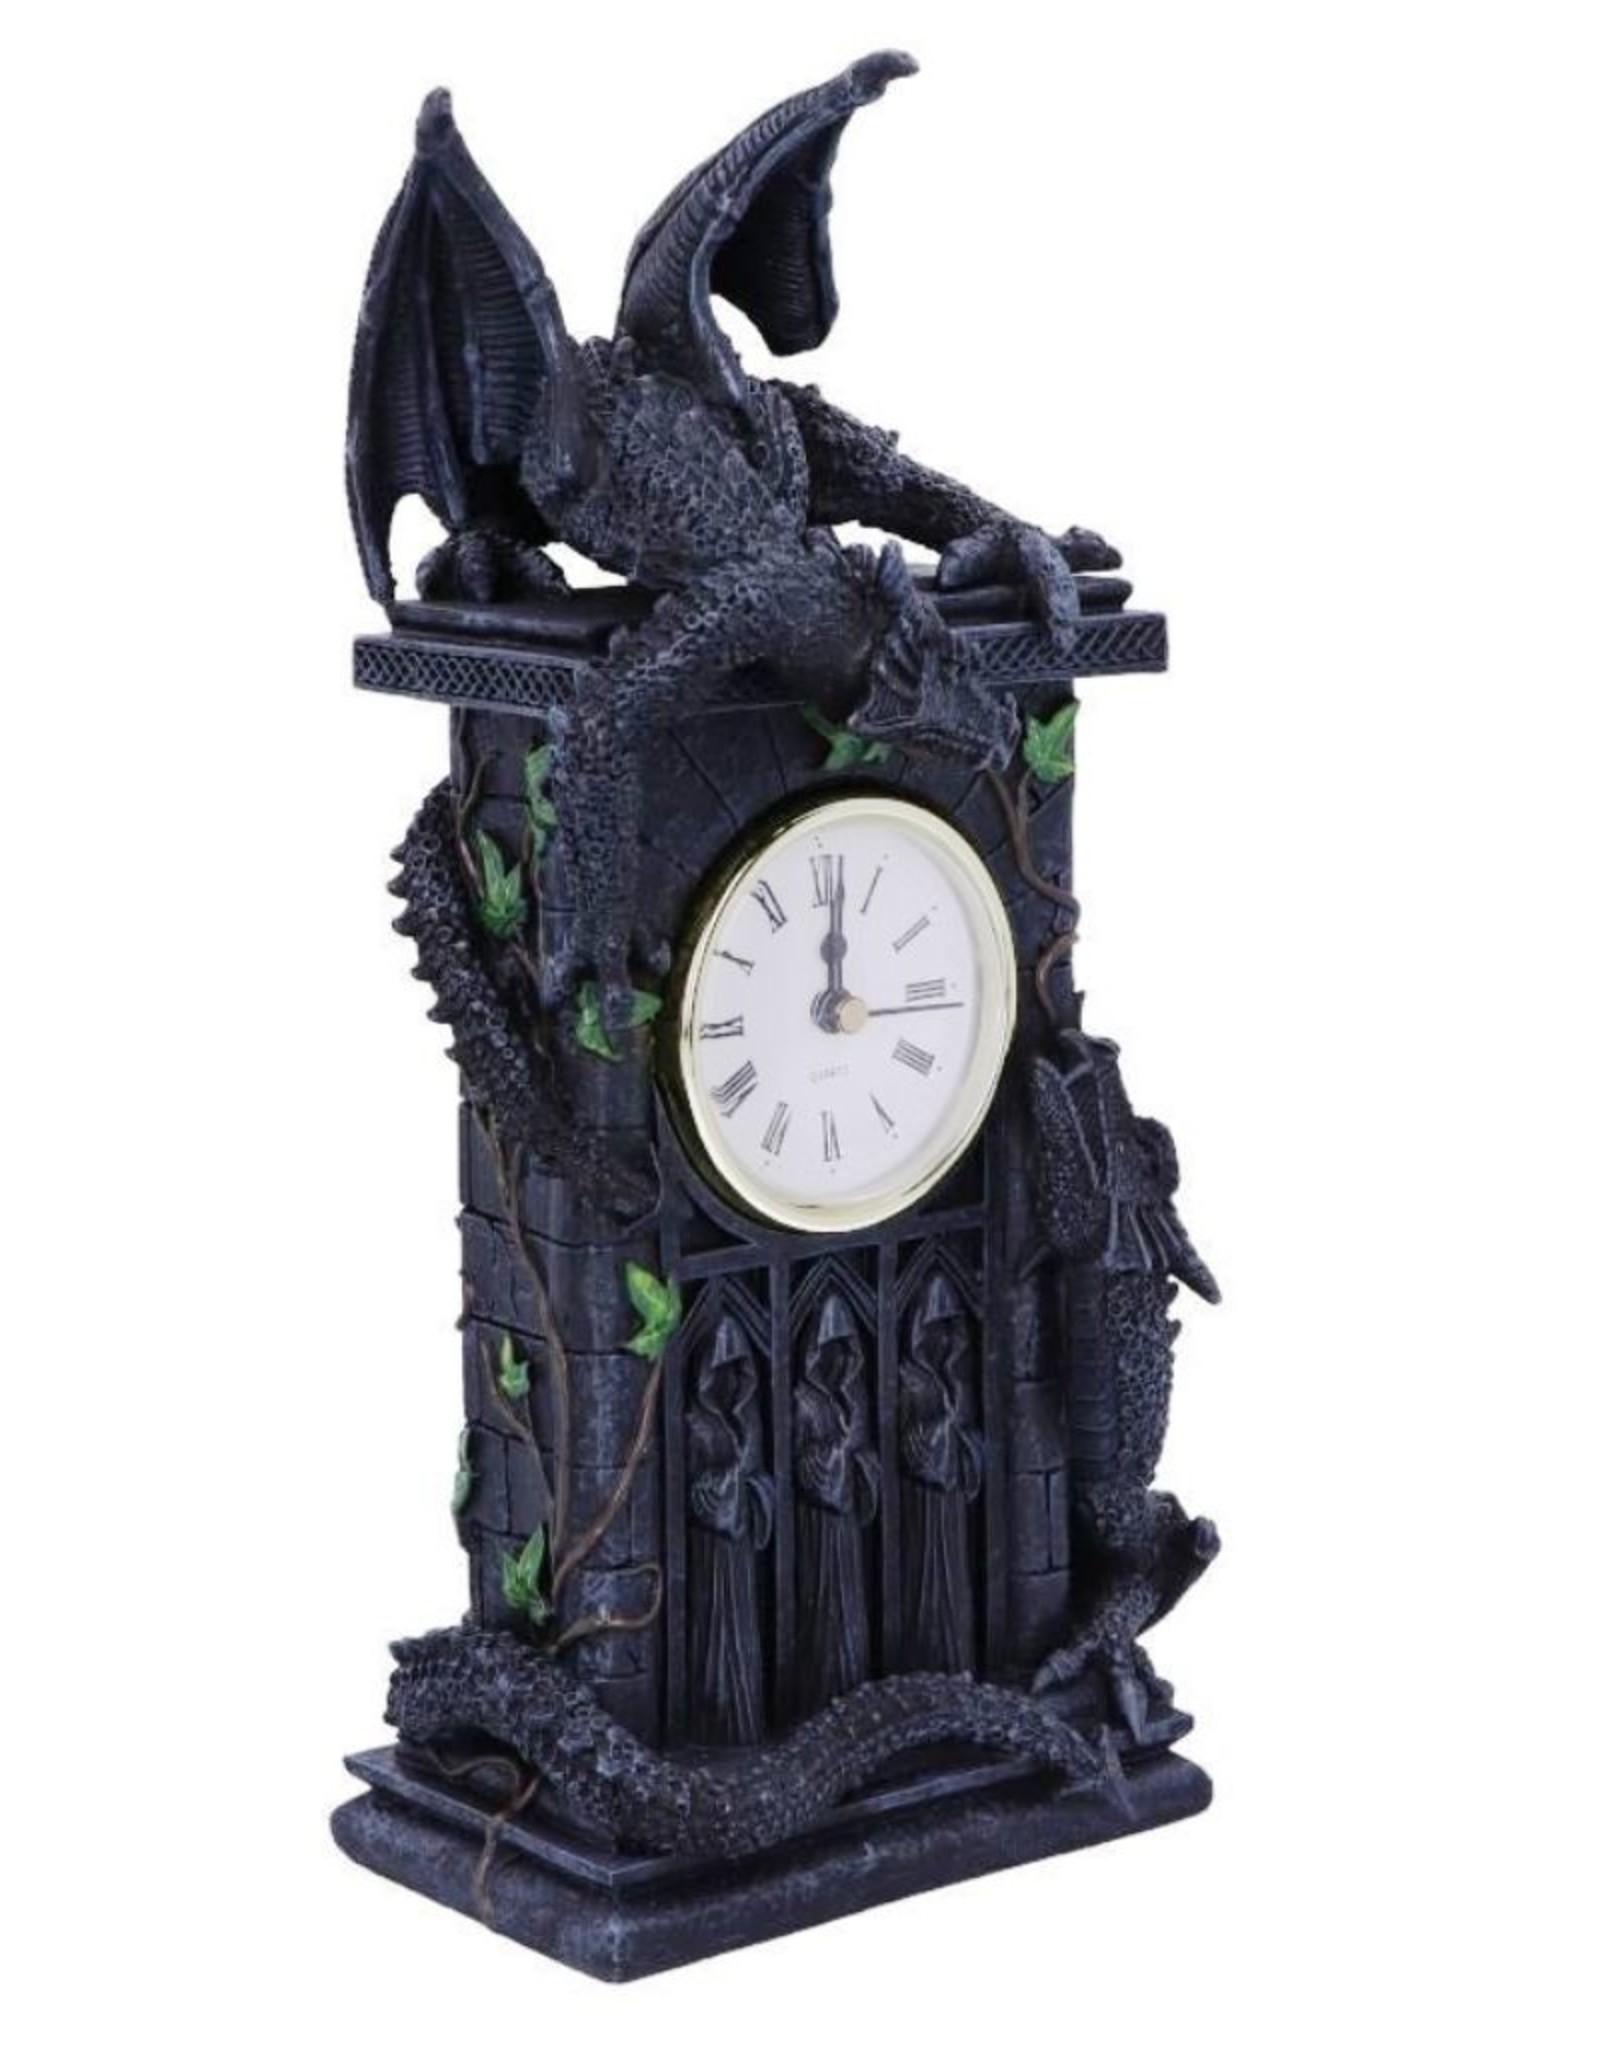 Alator Giftware & Lifestyle - Draken duel Tafelklok Nemesis Now (26cm)